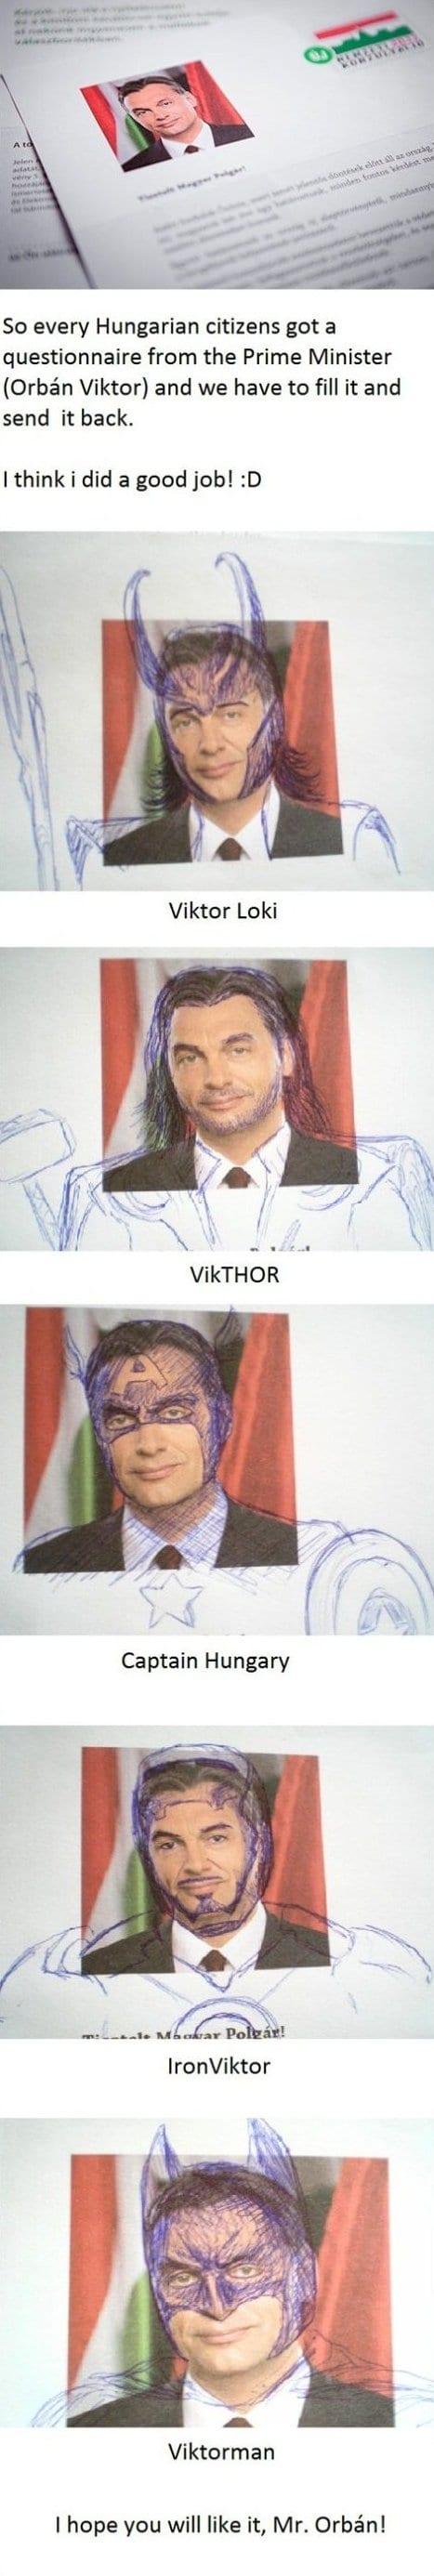 meme-lol-prime-minister-in-action